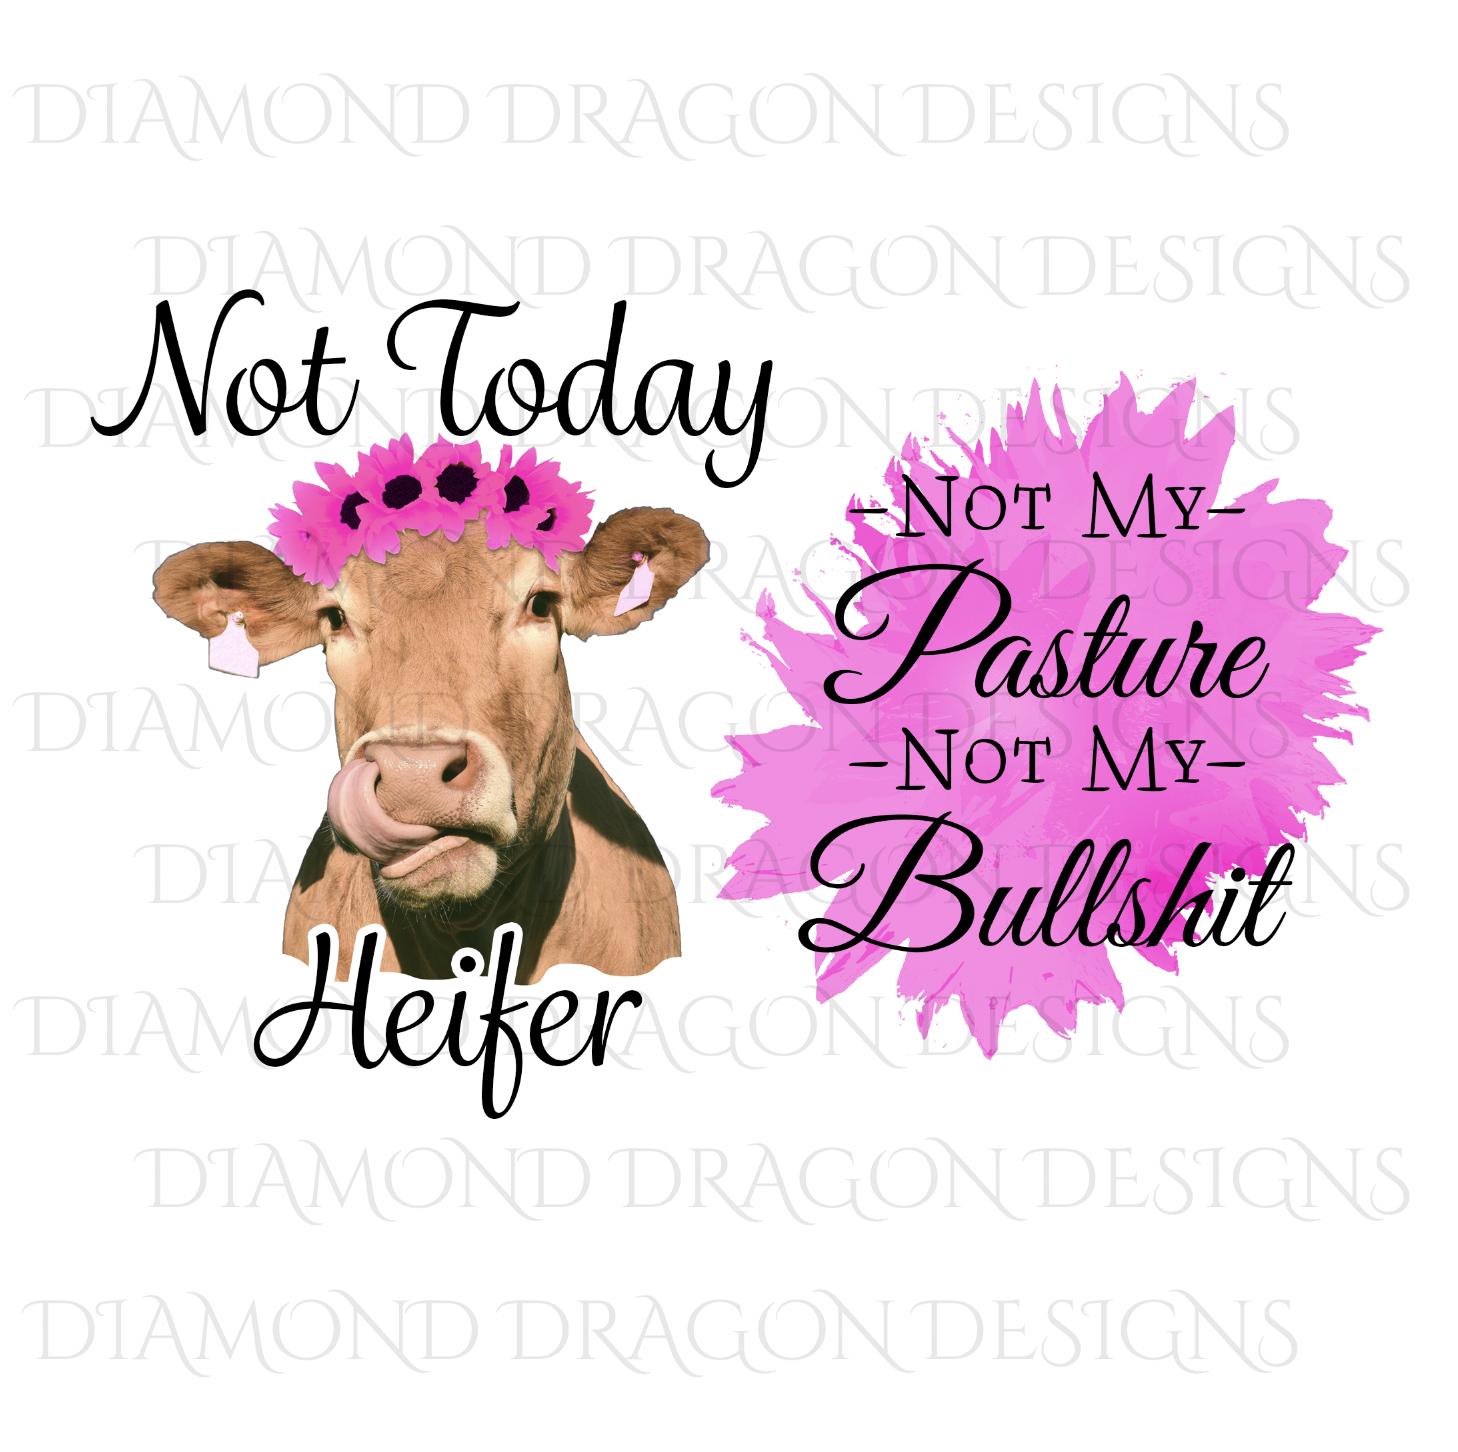 Cows - Heifer, Image, Bundle, Not Today Heifer, Not My Pasture Not My Bullshit, HOT Pink Sunflower